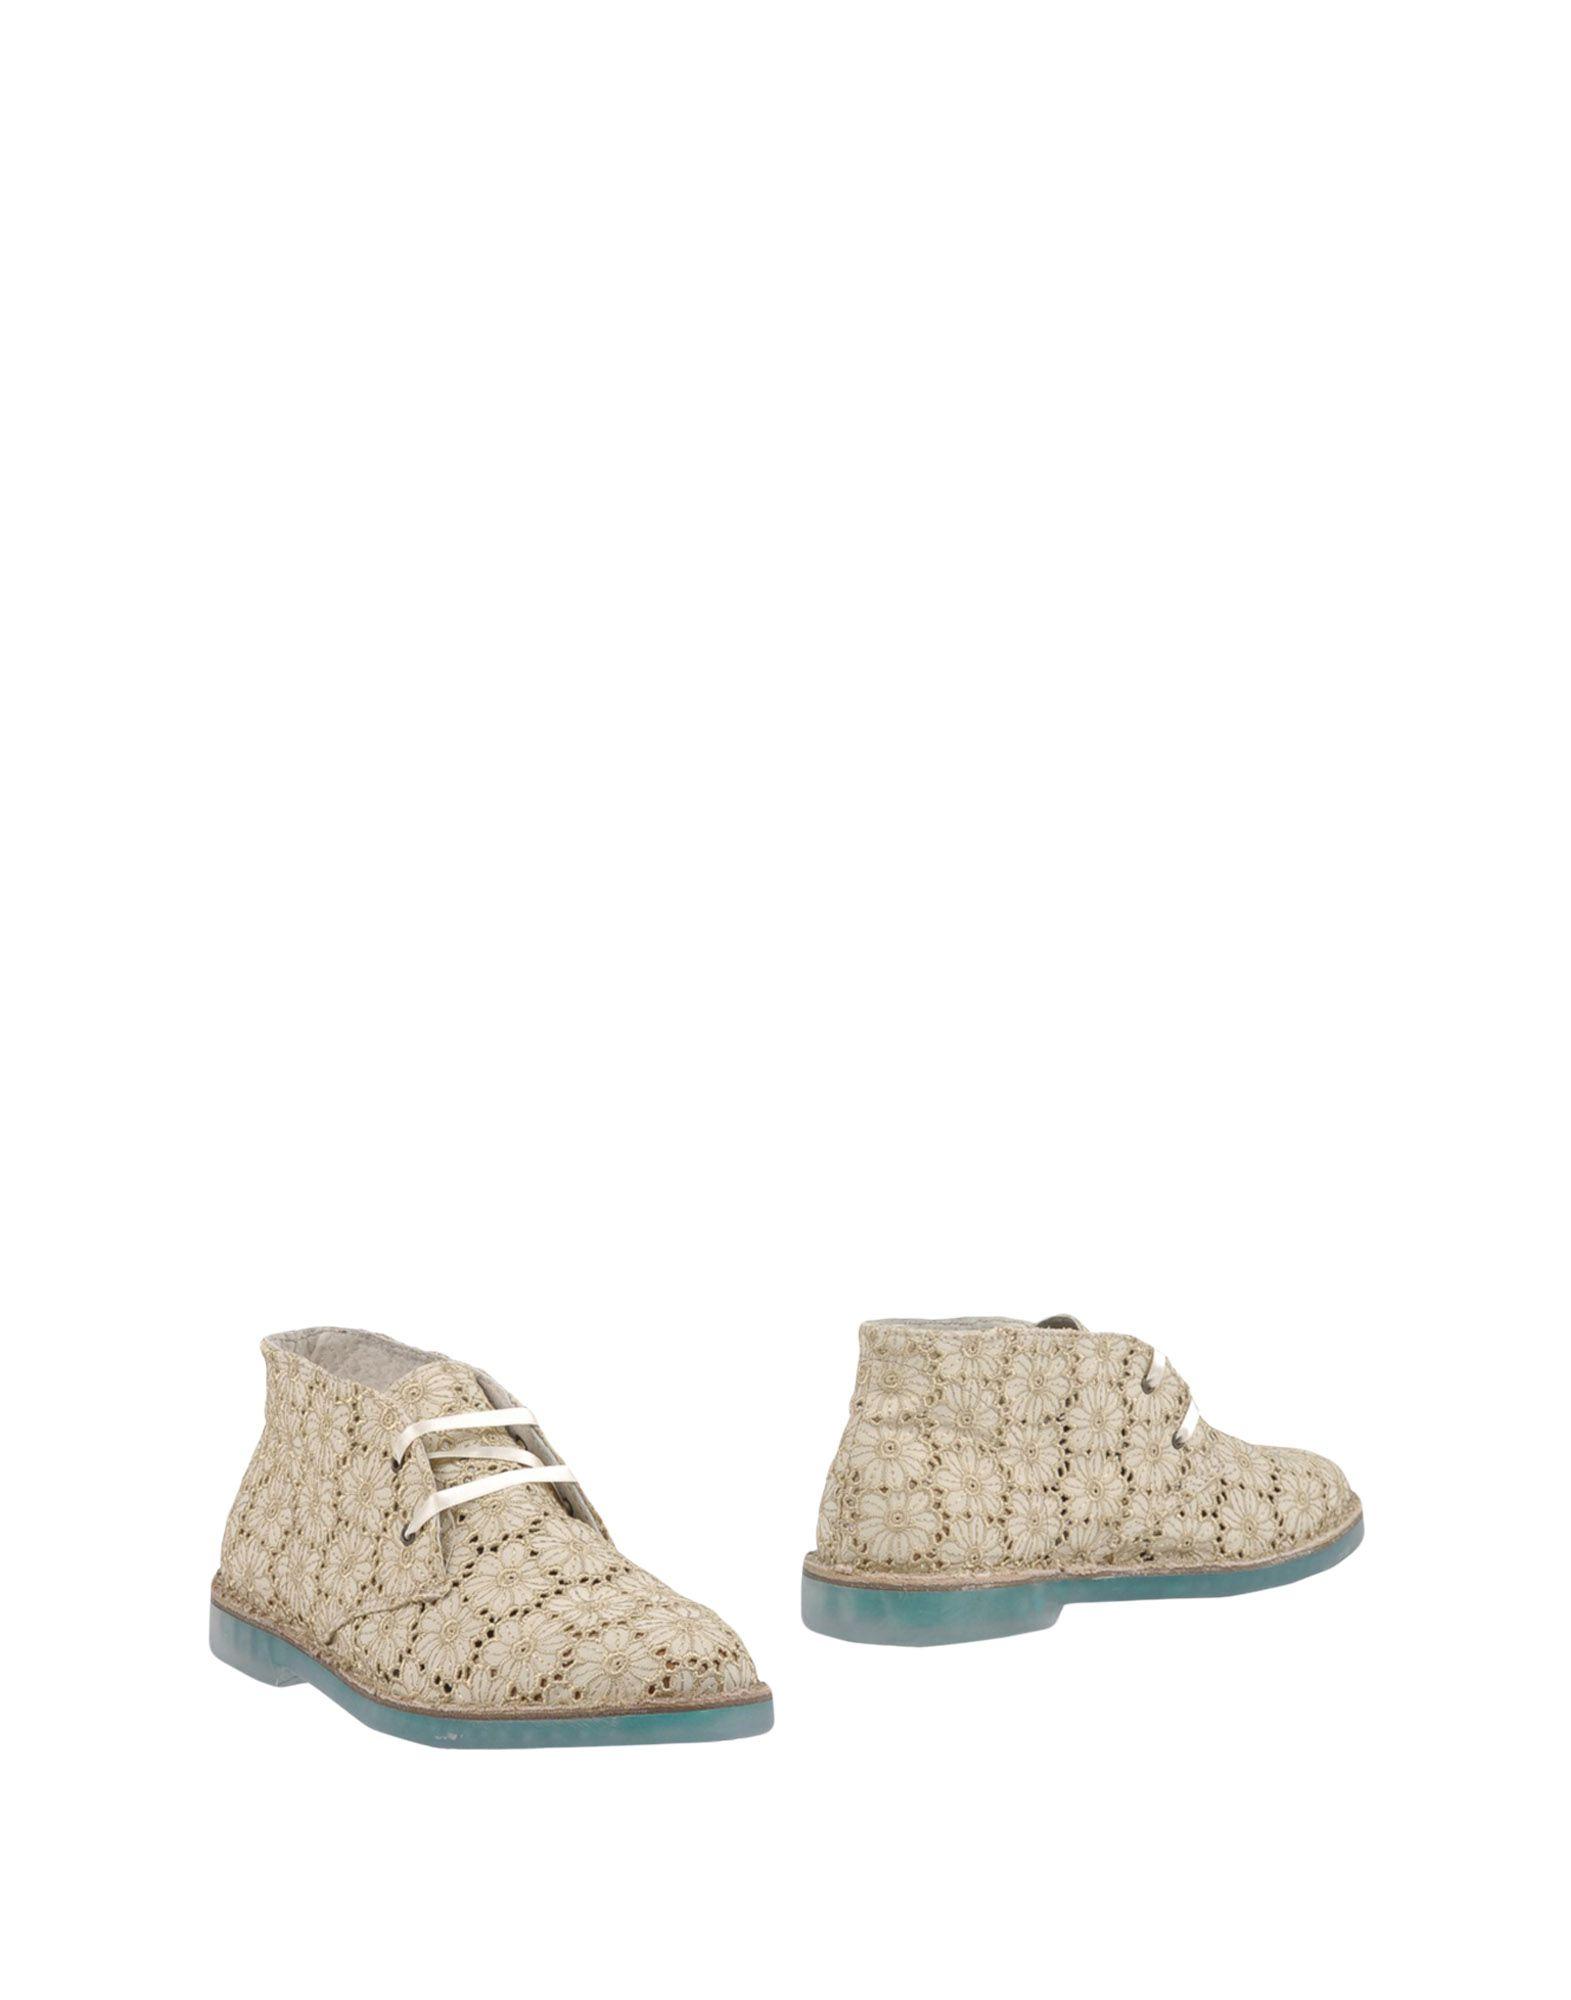 Wally Walker Stiefelette Damen  11125468CC Gute Qualität beliebte Schuhe Schuhe beliebte 05ee15